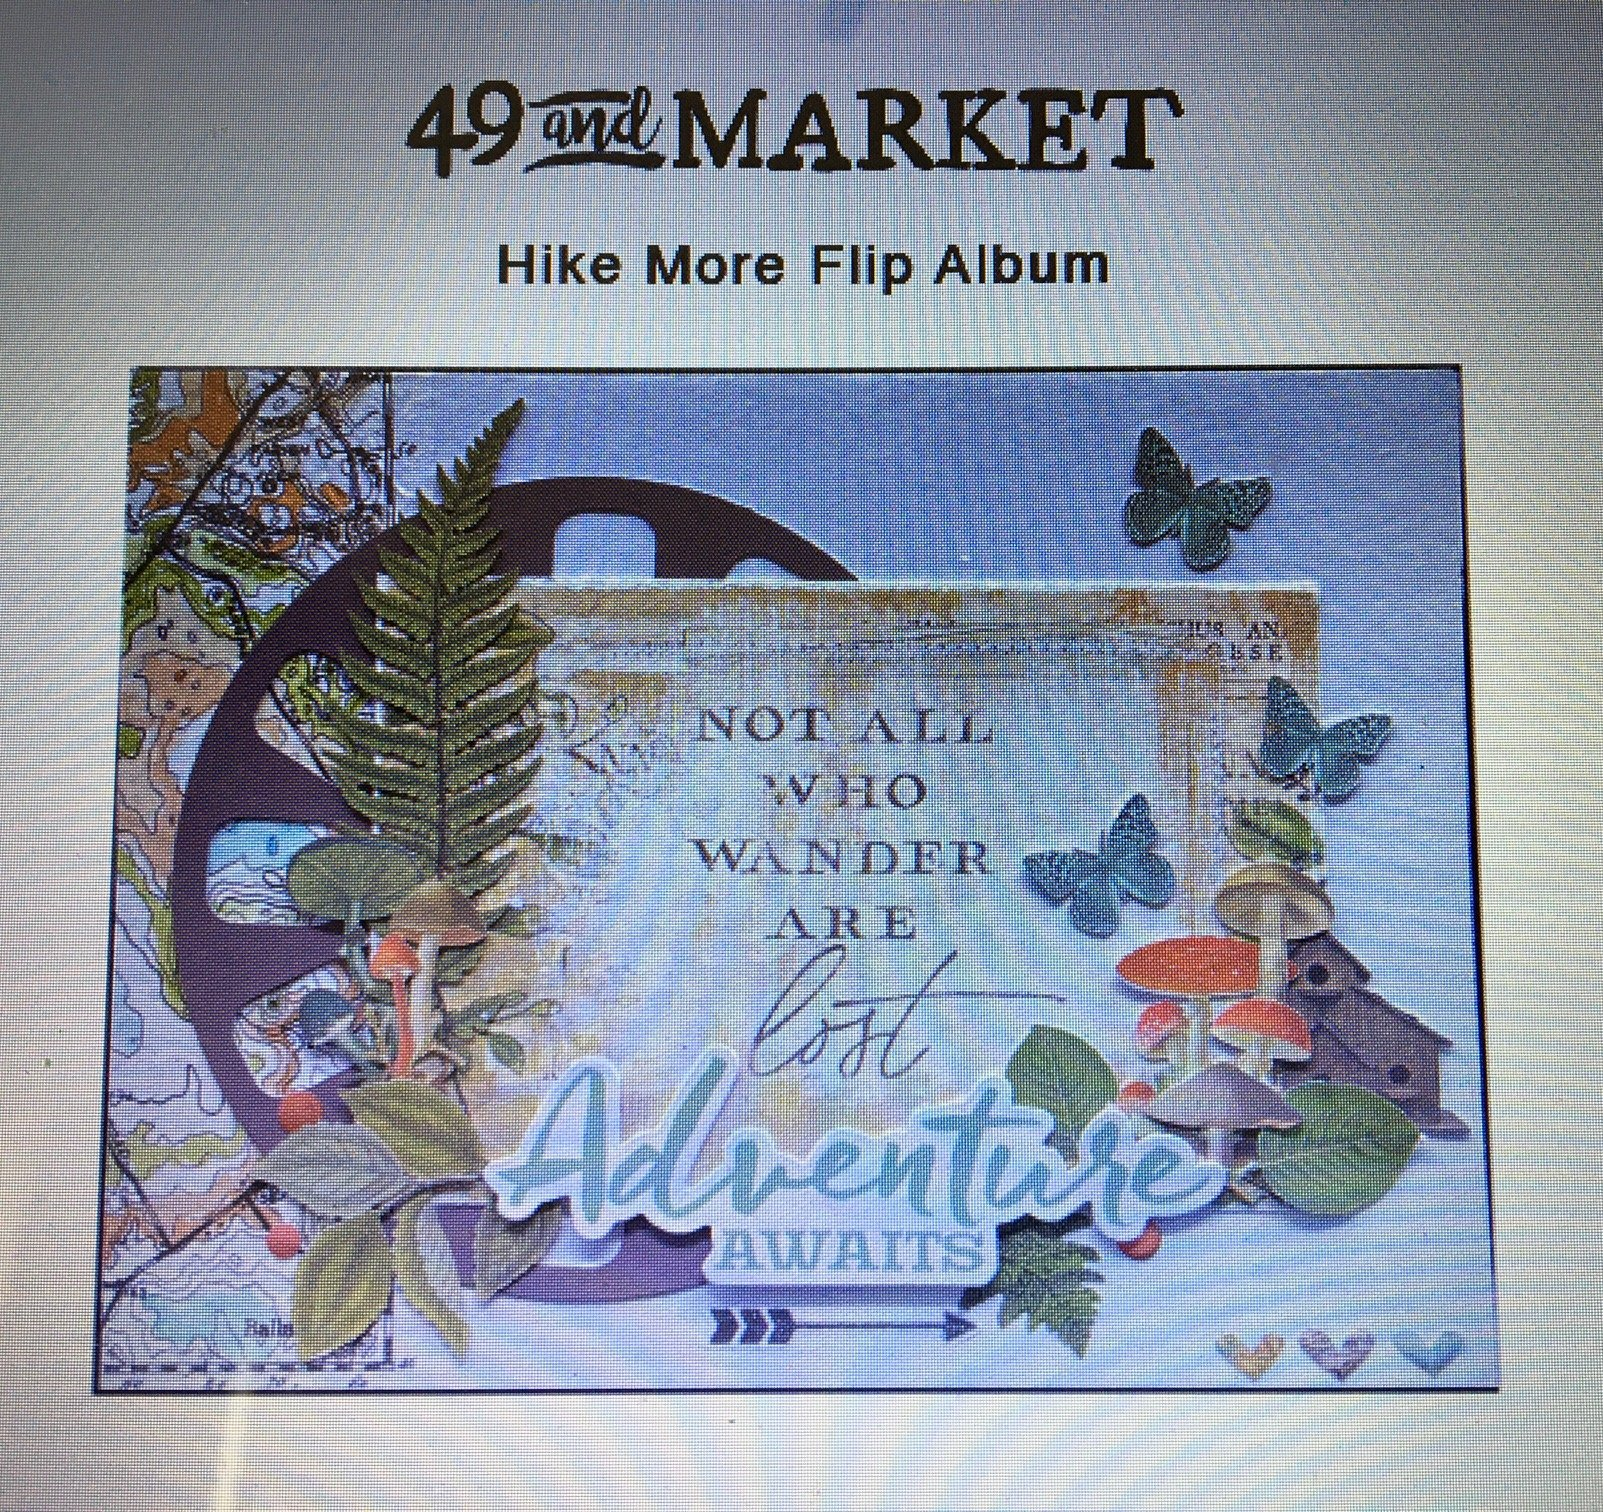 Mystery Monday Kit #59 Hike More Flip Album Kit 49 and Market